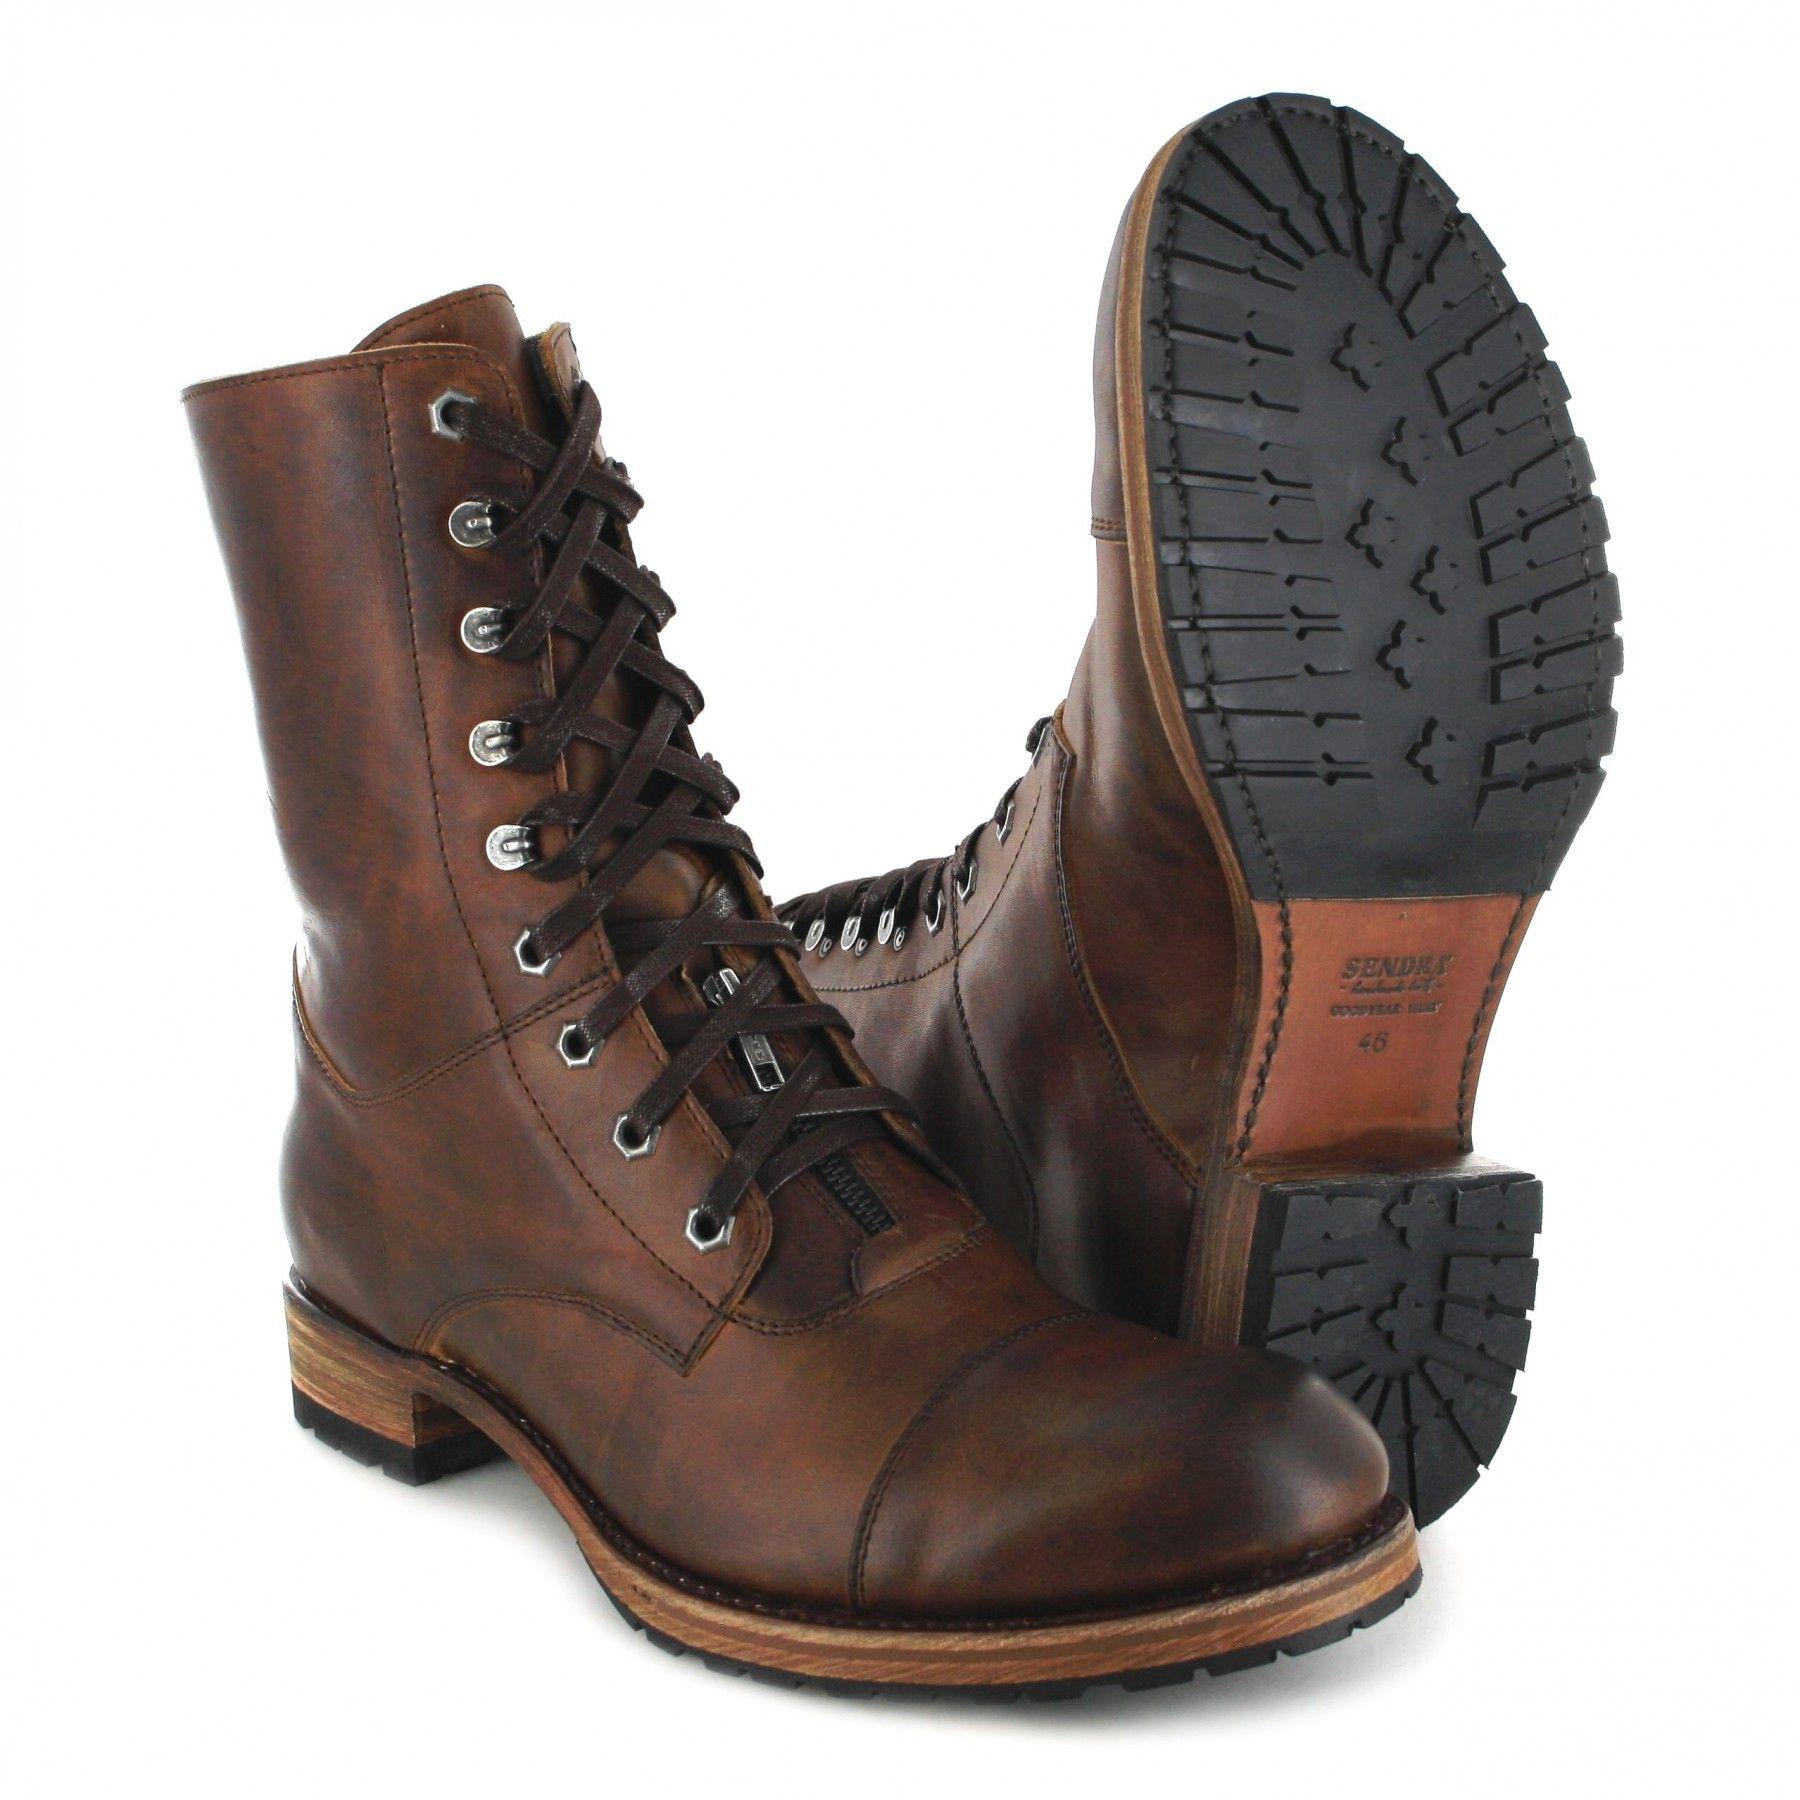 Urban Sendra Boots Braun 12334 Tang In Boot Schnürstiefel TJlFcK1